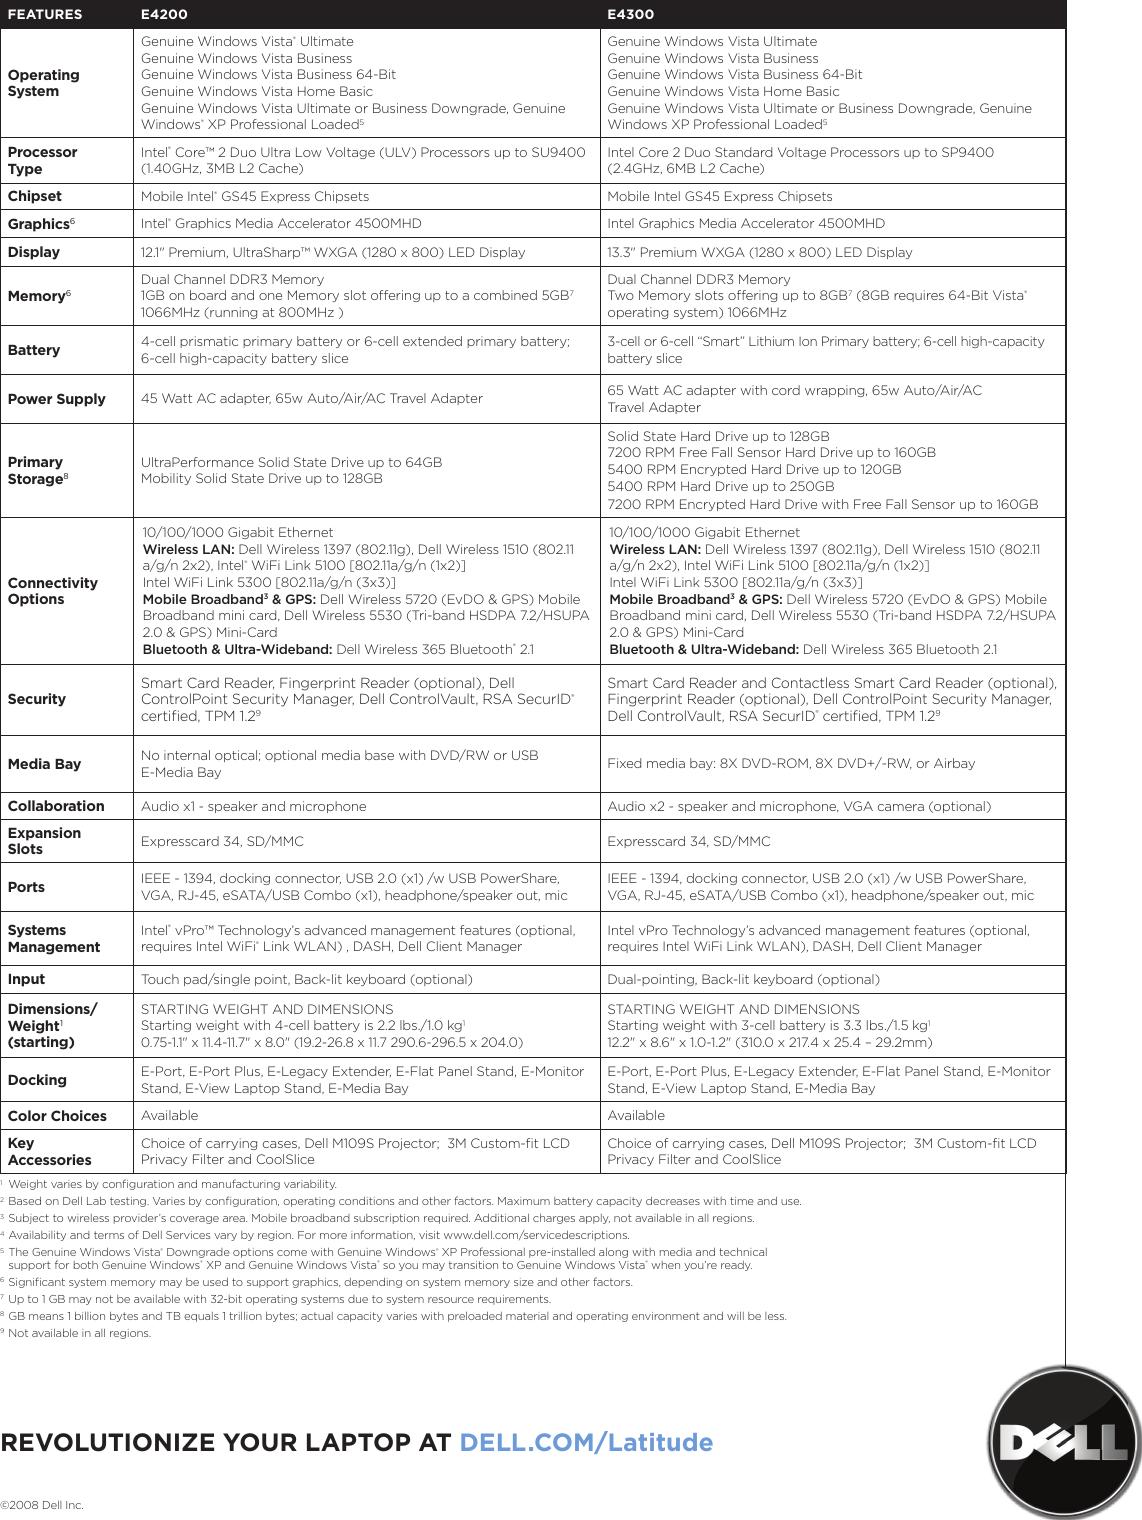 Dell Laptop E4200 Users Manual